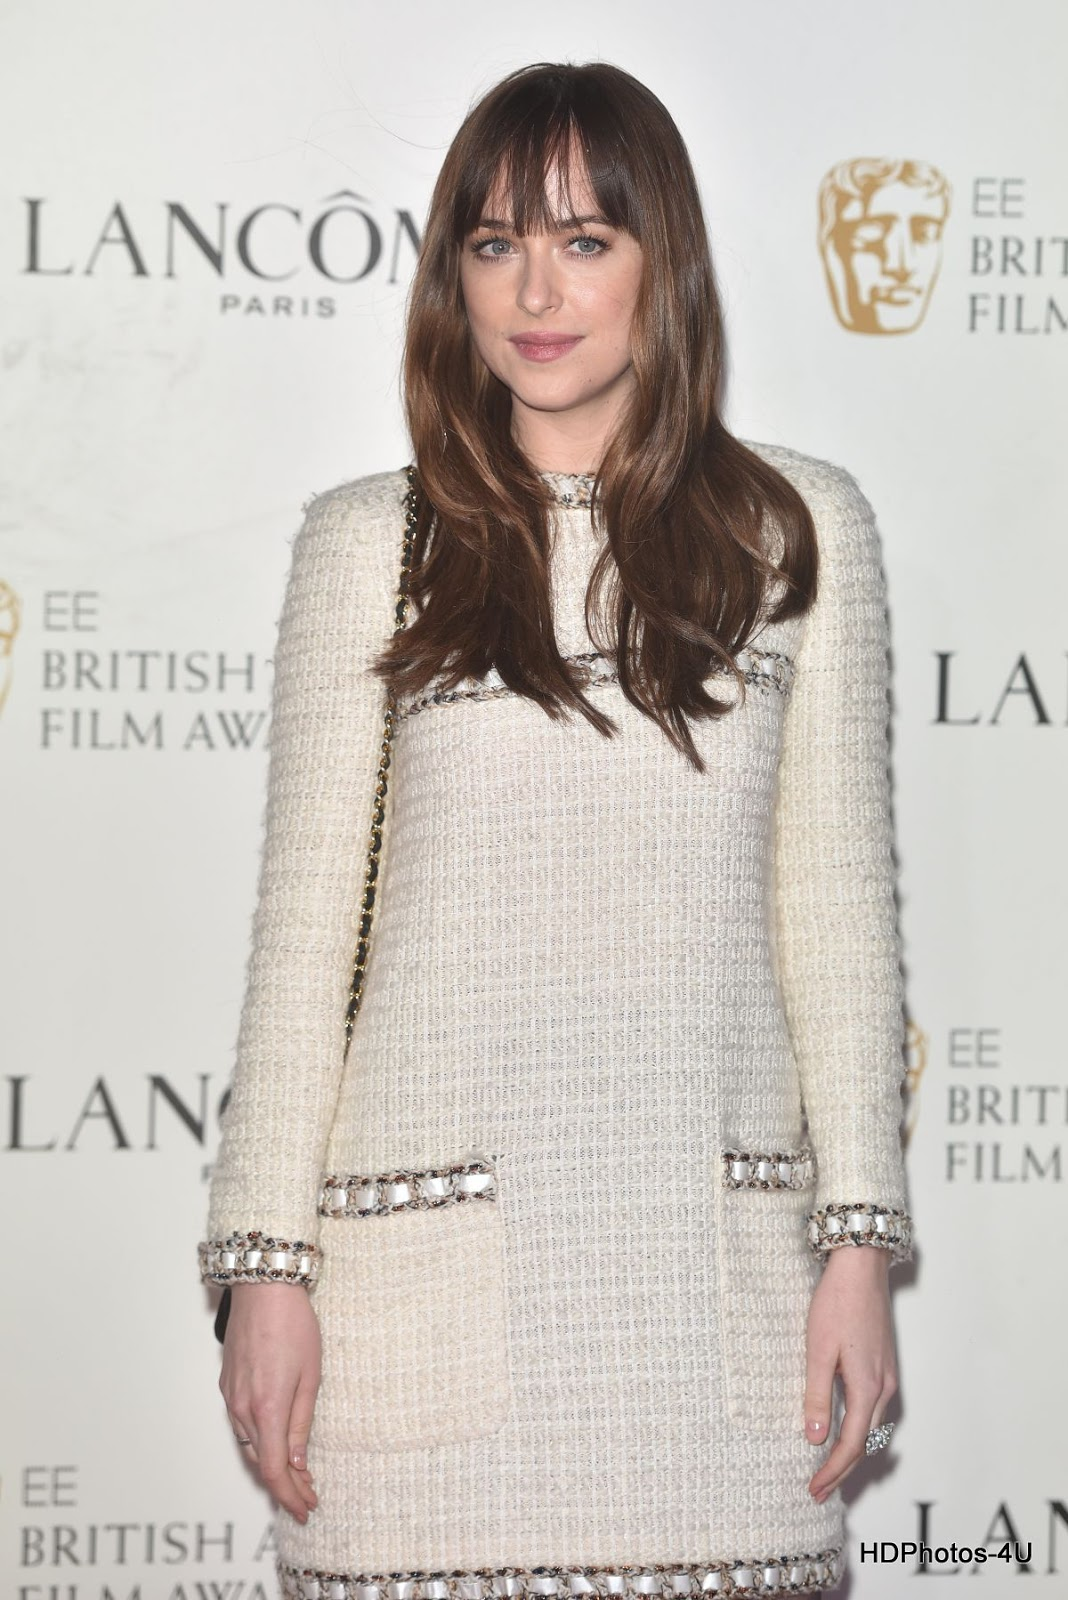 Full HQ Photos of Dakota Johnson at Lancome Bafta 2016 Nominees Party in London